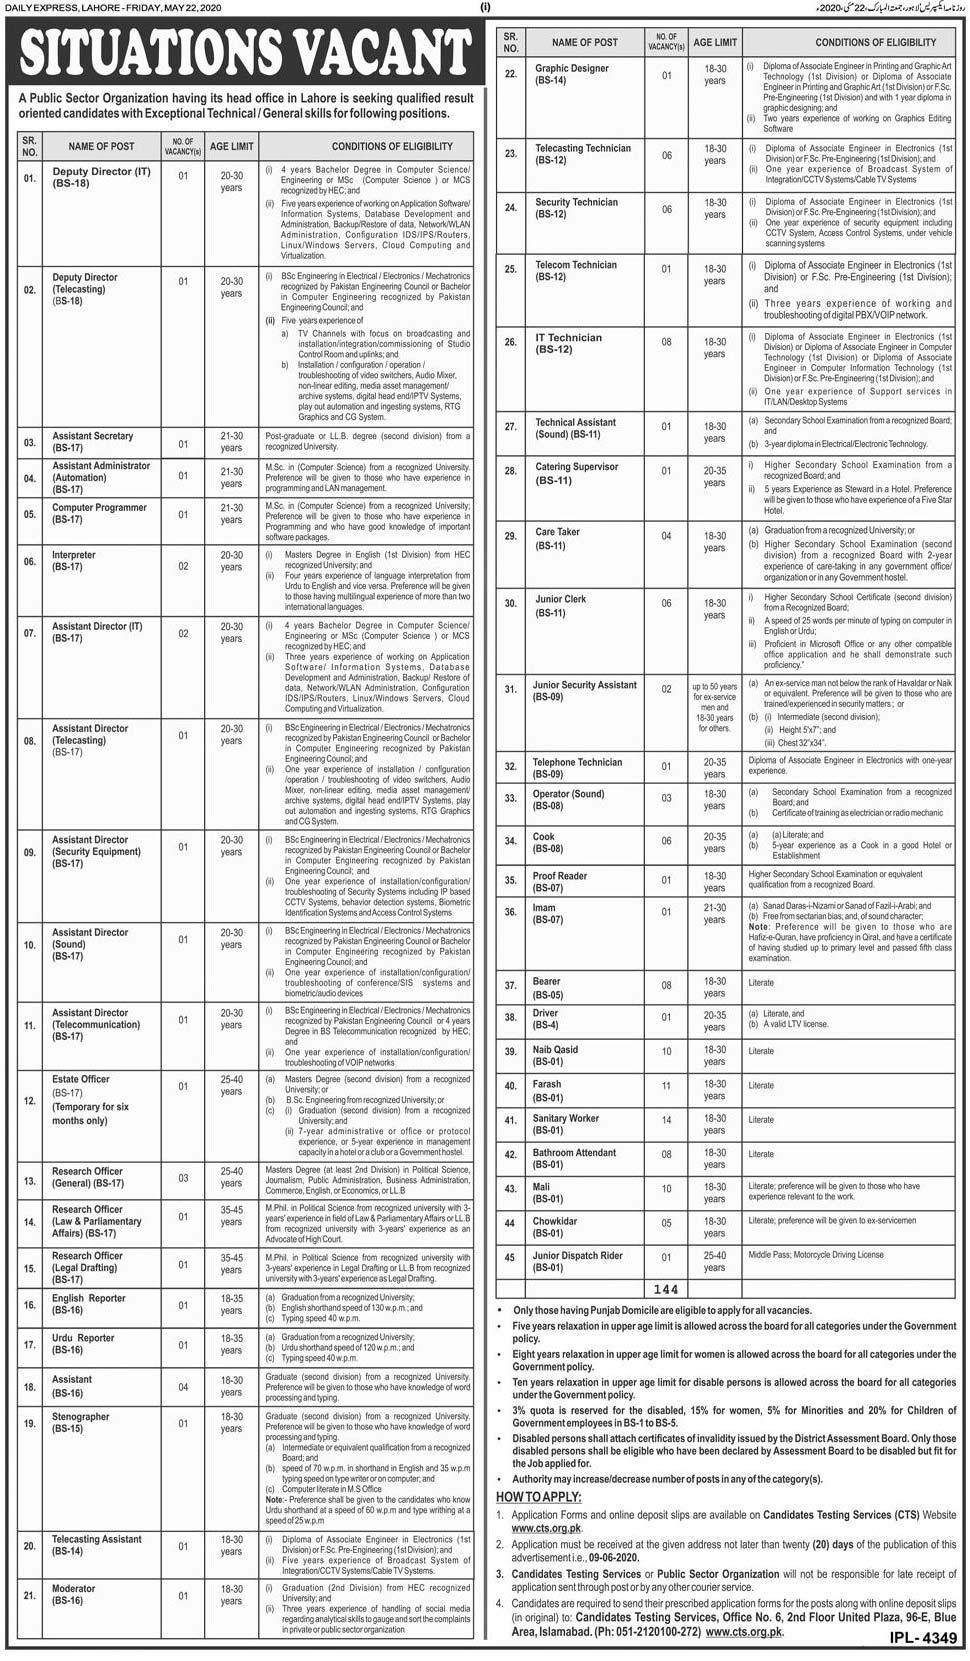 Public Sector Organization Jobs 2020 Latest